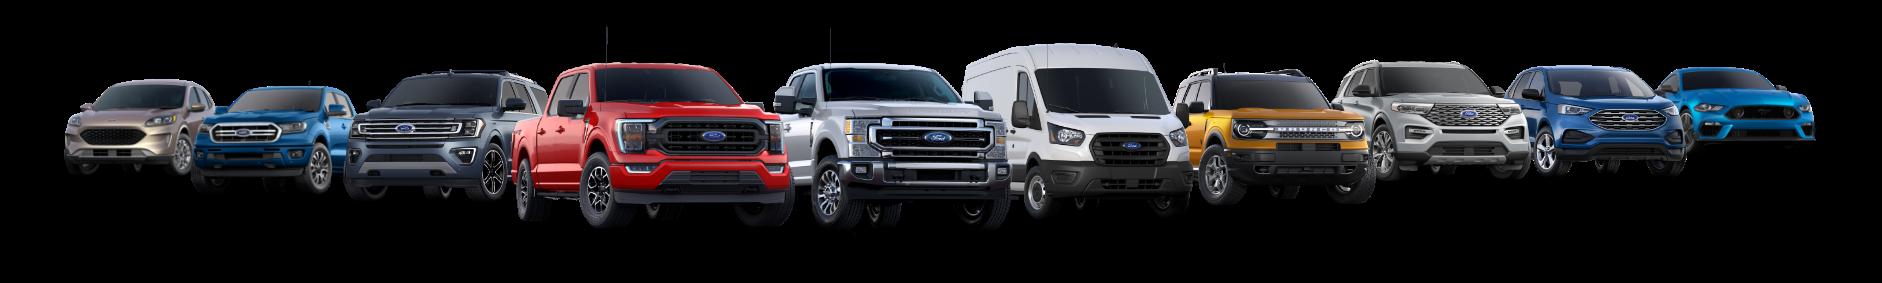 Mullinax Ford Custom Order - Ford Model Lineup